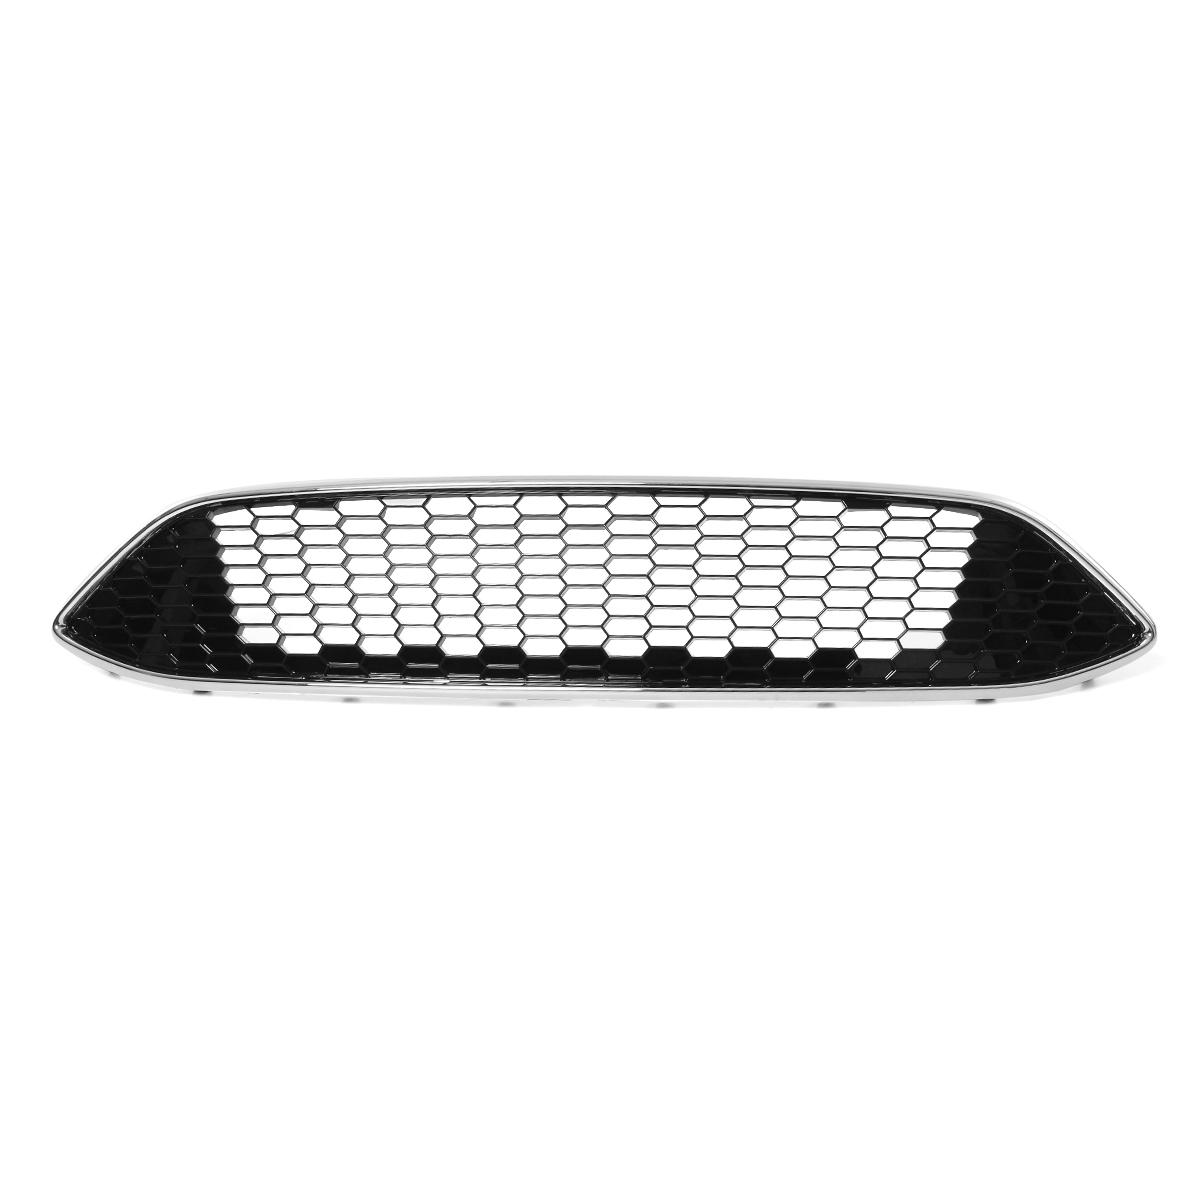 Ford Focus Zetec S Sport Front Bumper Fog Light Honeycomb Grille 2015/>2018